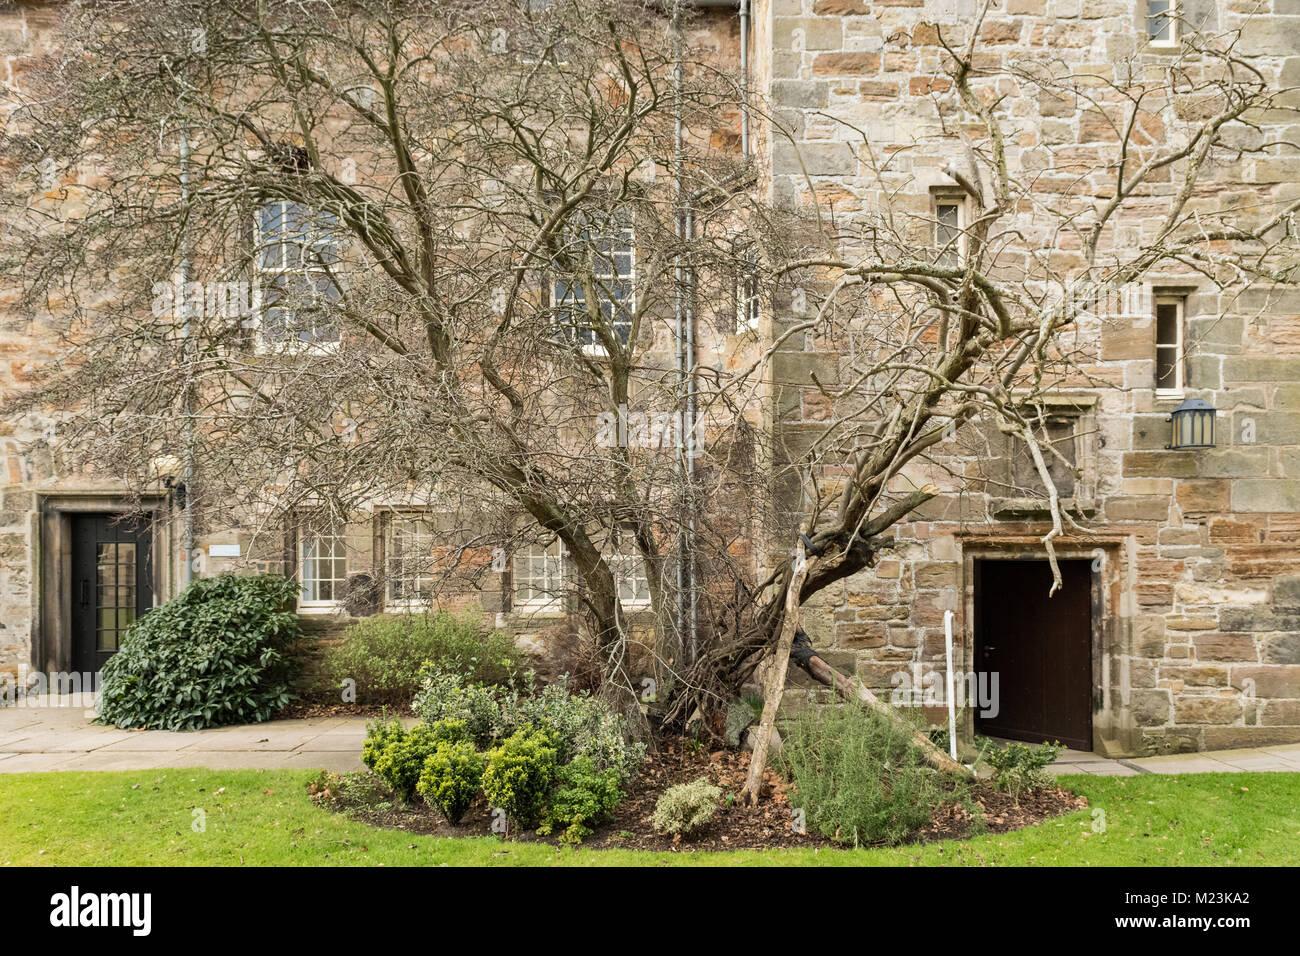 St Mary's Hawthorn, St Mary's Quadrangle, St Andrews University, Scotland, UK - Stock Image